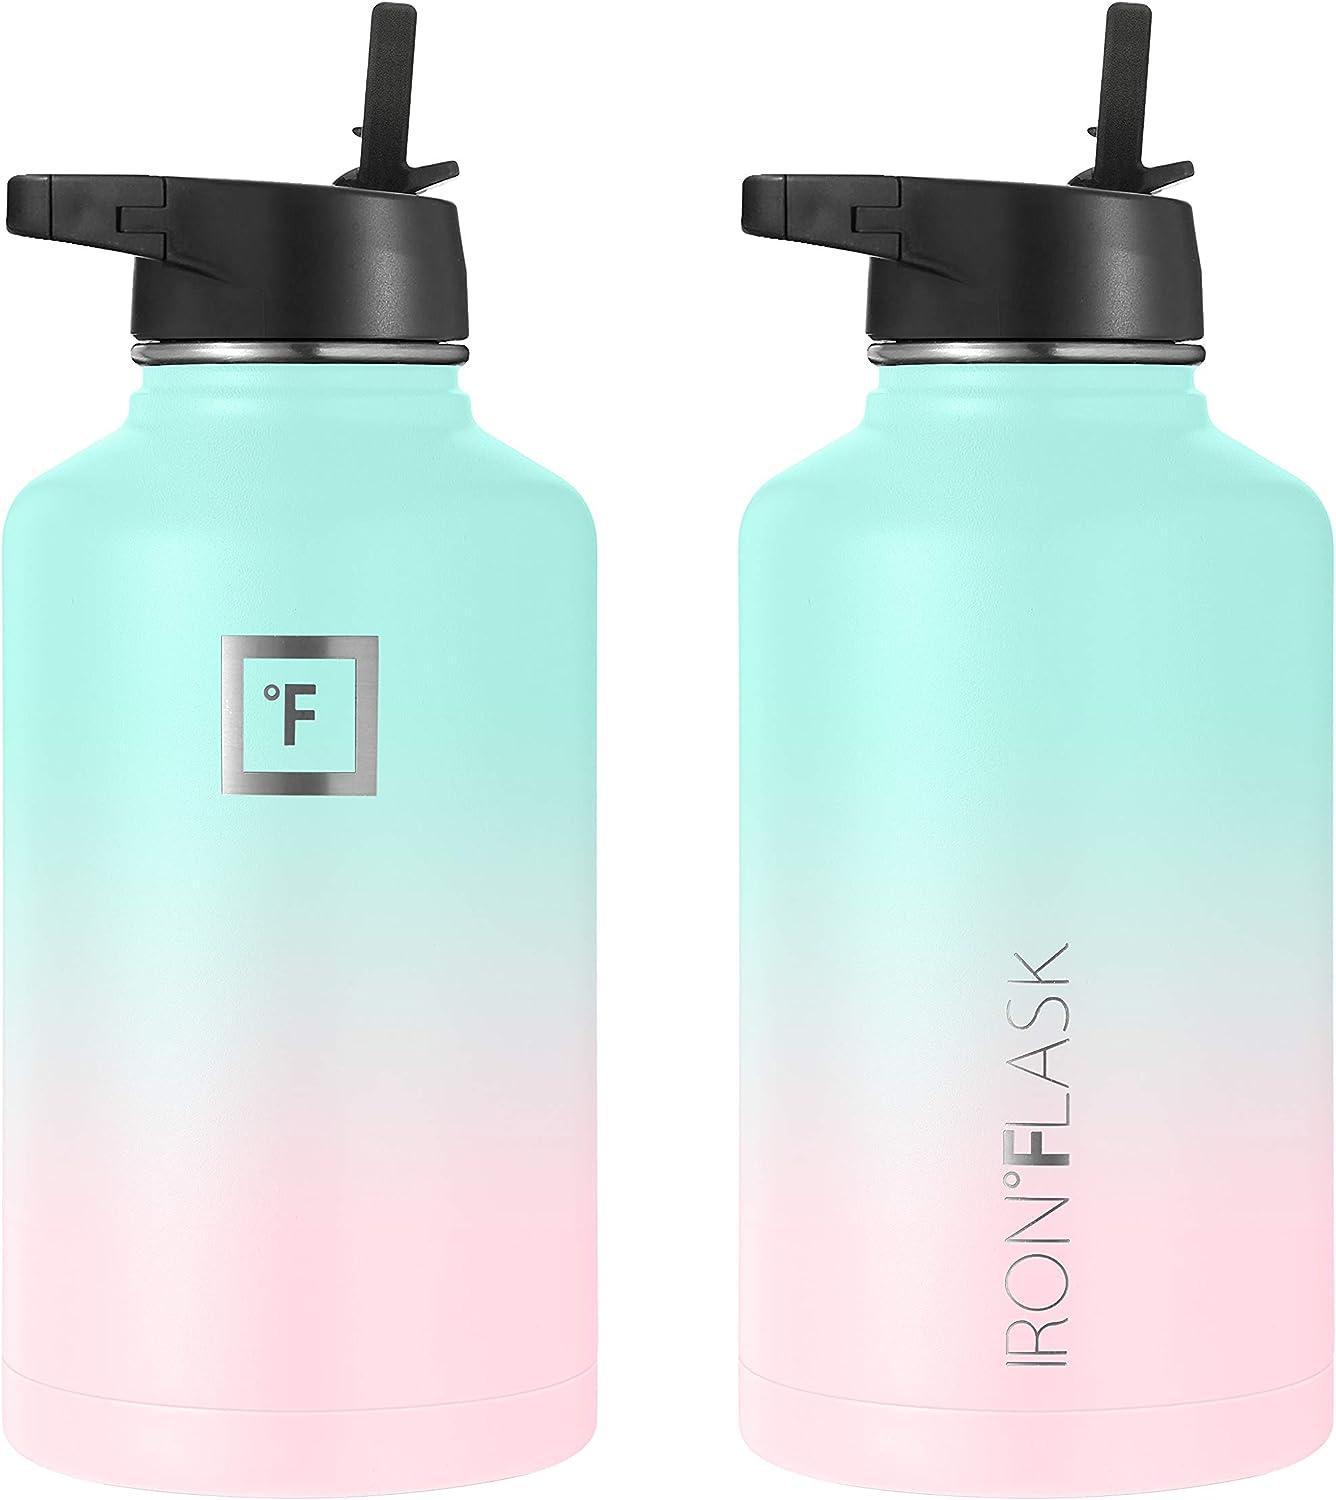 Straw Lid 14Oz,18Oz,22Oz,32Oz,40Oz,64Oz,3 Lids Iron Flask Sports Water Bottle